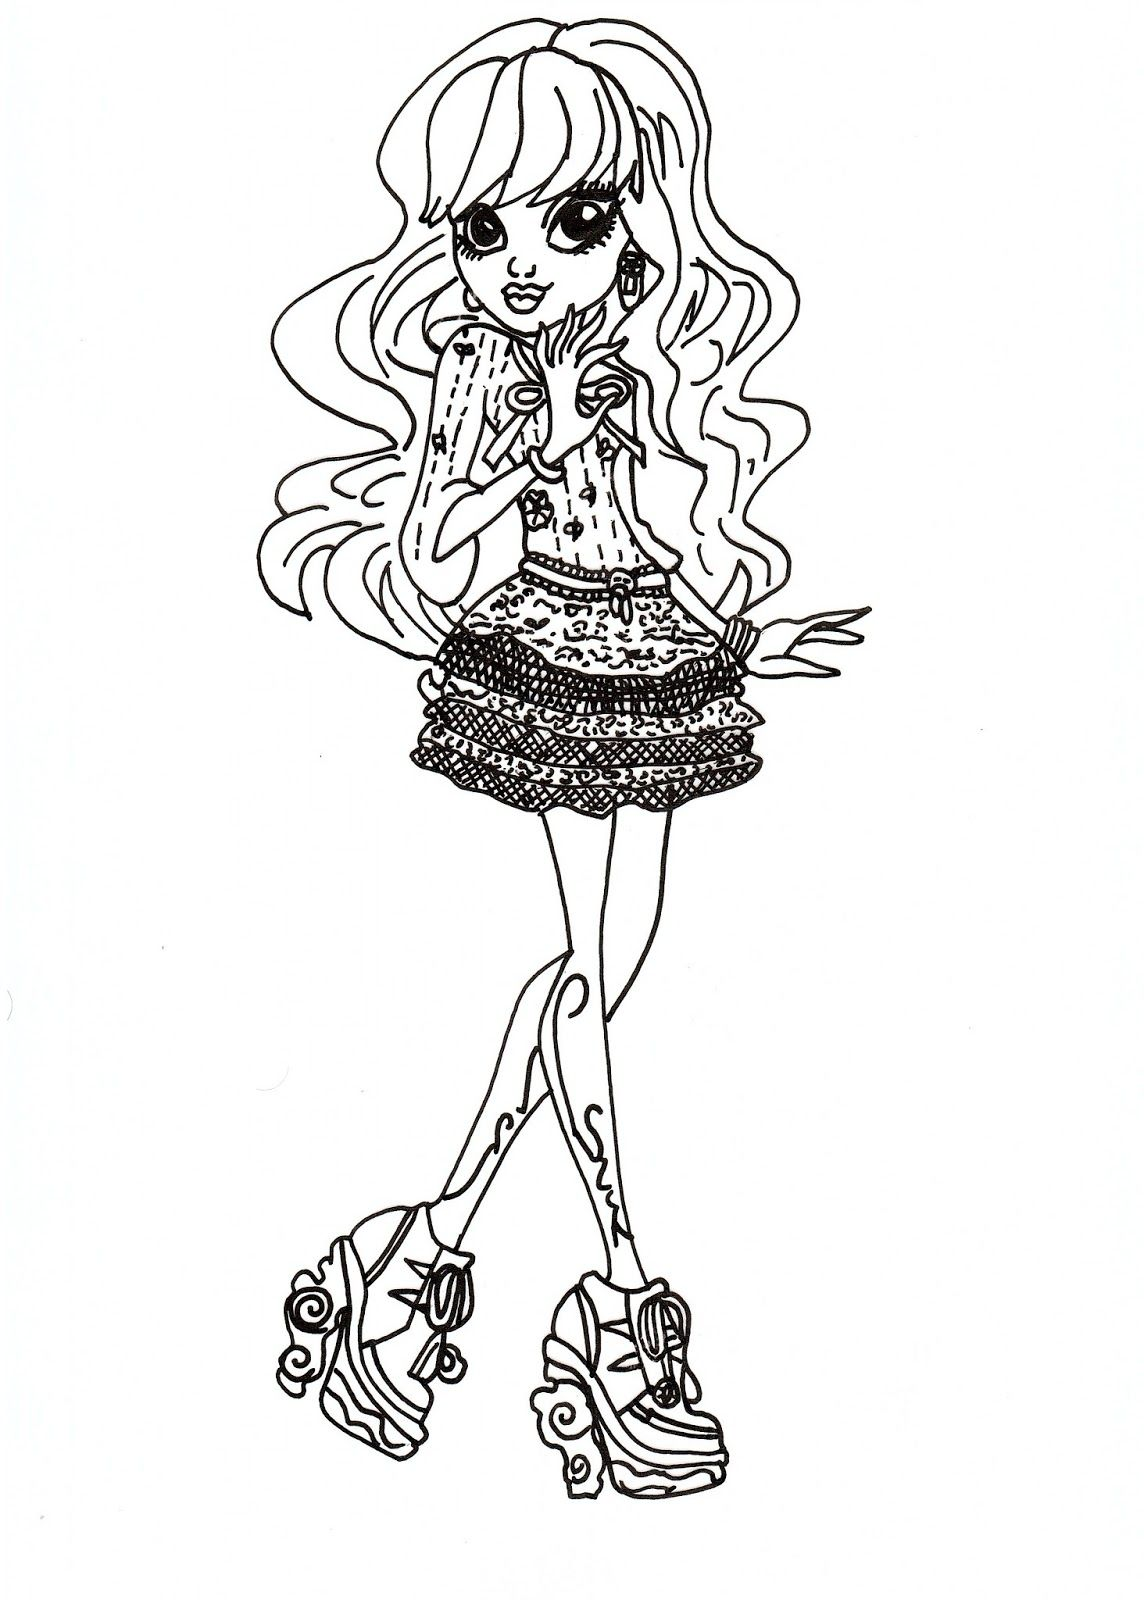 Twyla Coloring Sheet Jpg 1144 1600 2 Color Monster High